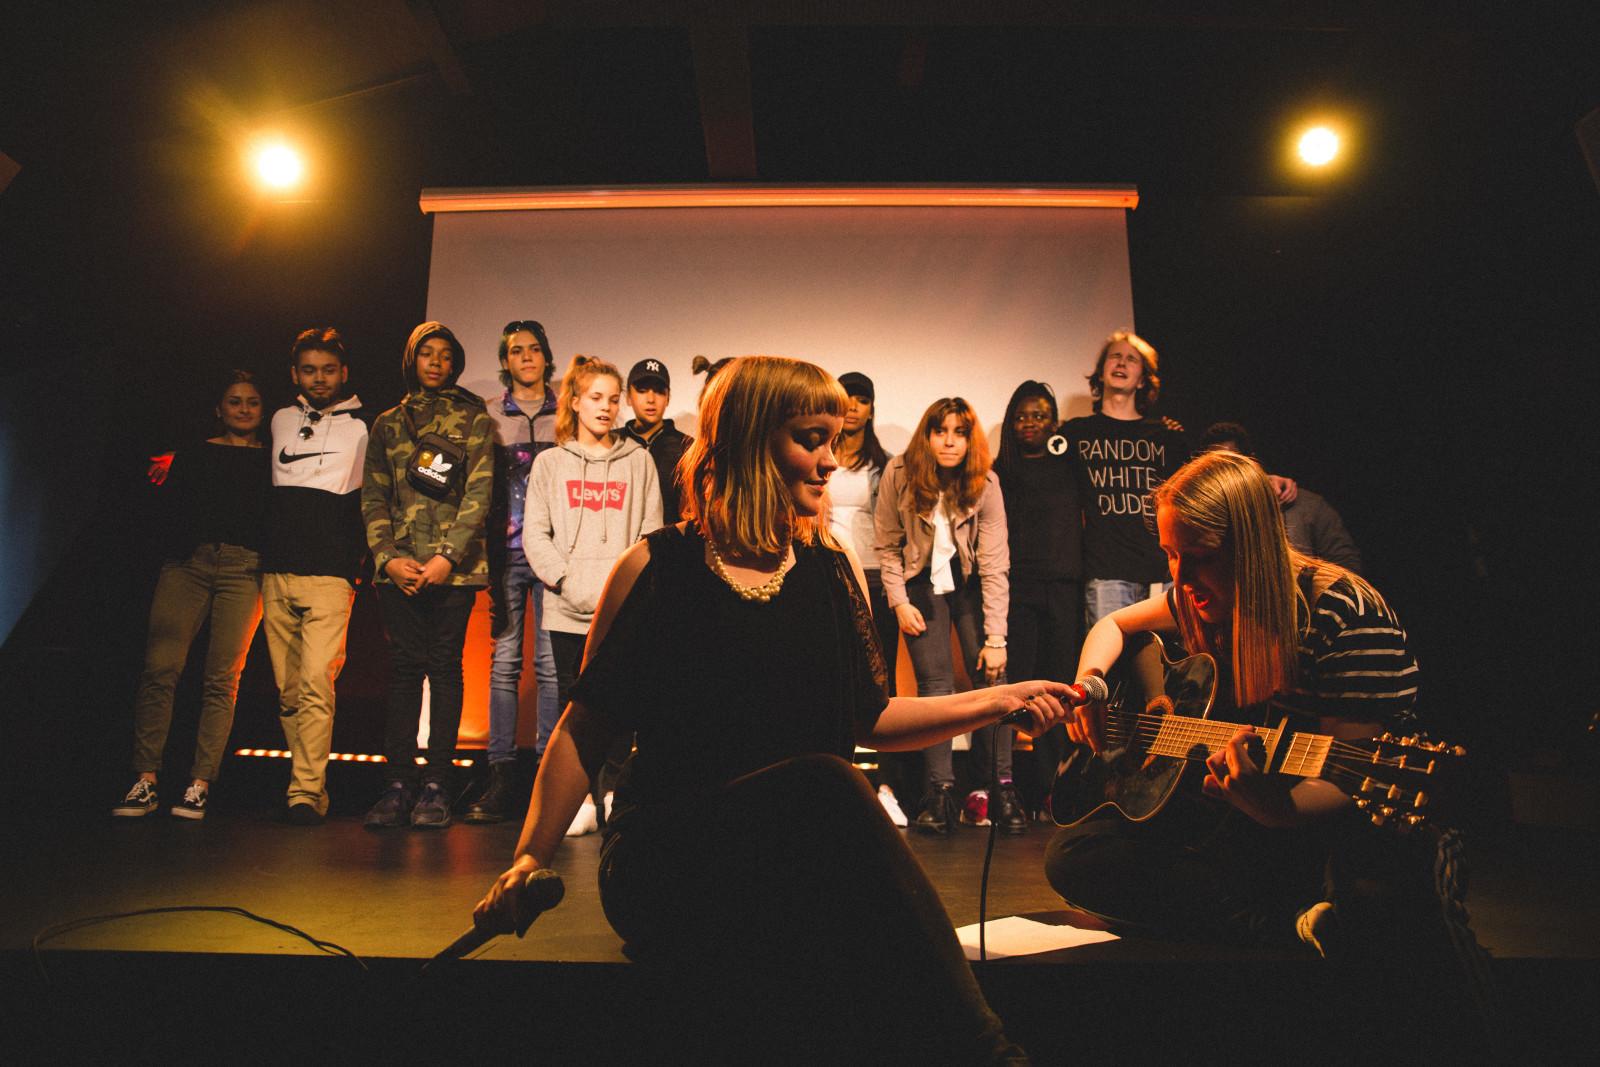 Fra Agenda X-revyen i 2017: Godt & blandet. Regine Folkmann Rossnes i forgrunnen f.v. Foto: Samir Madad